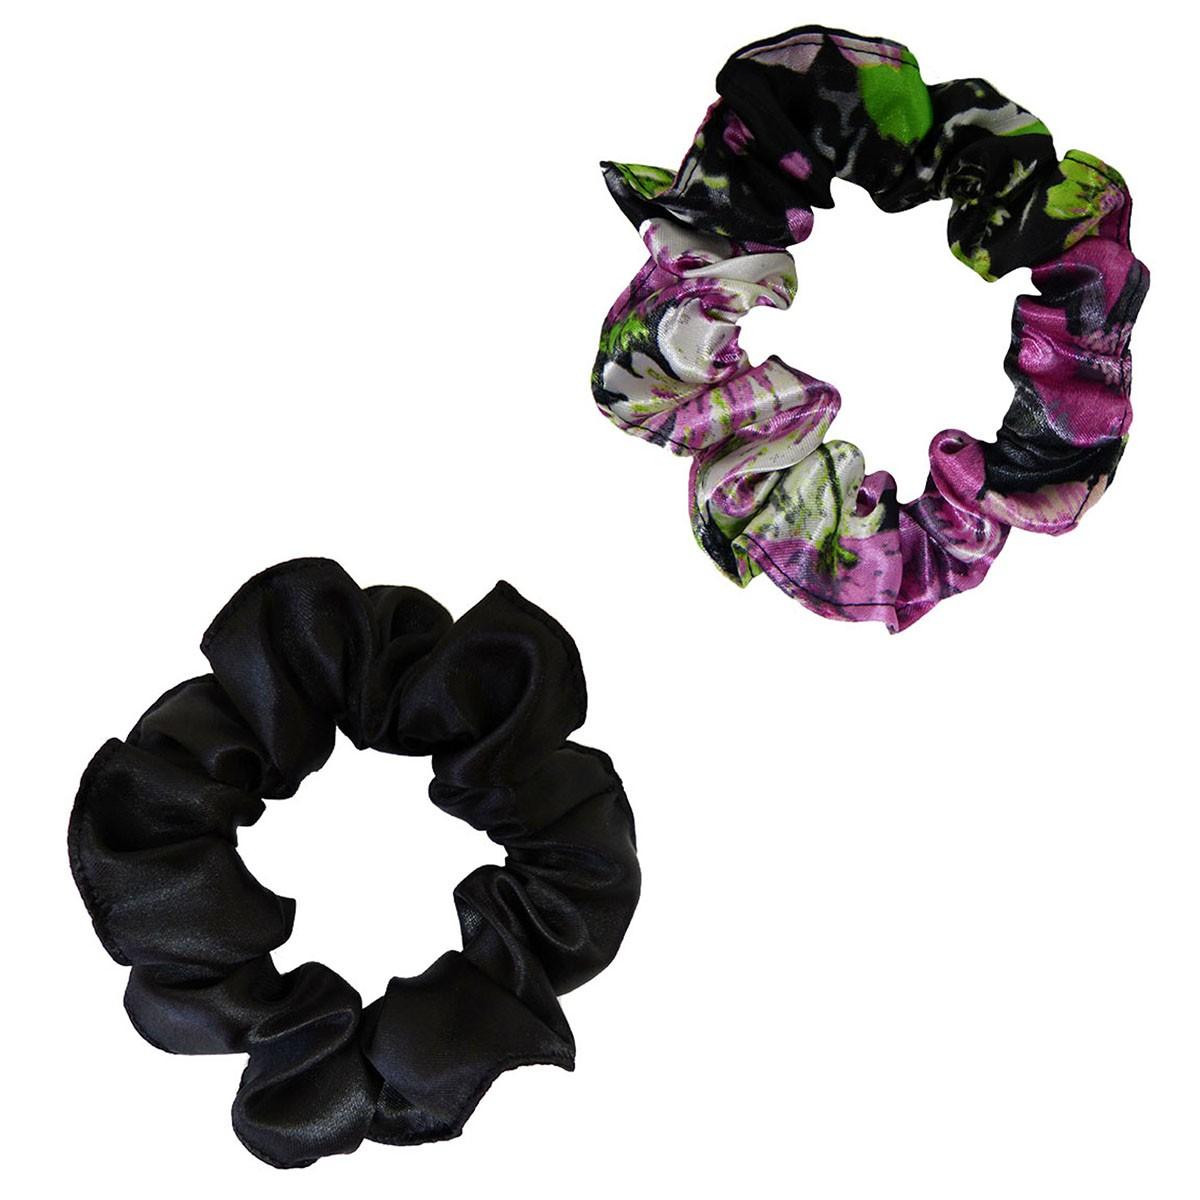 Kit Xuxinhas - Rosa Floral e Preta - Anti Frizz